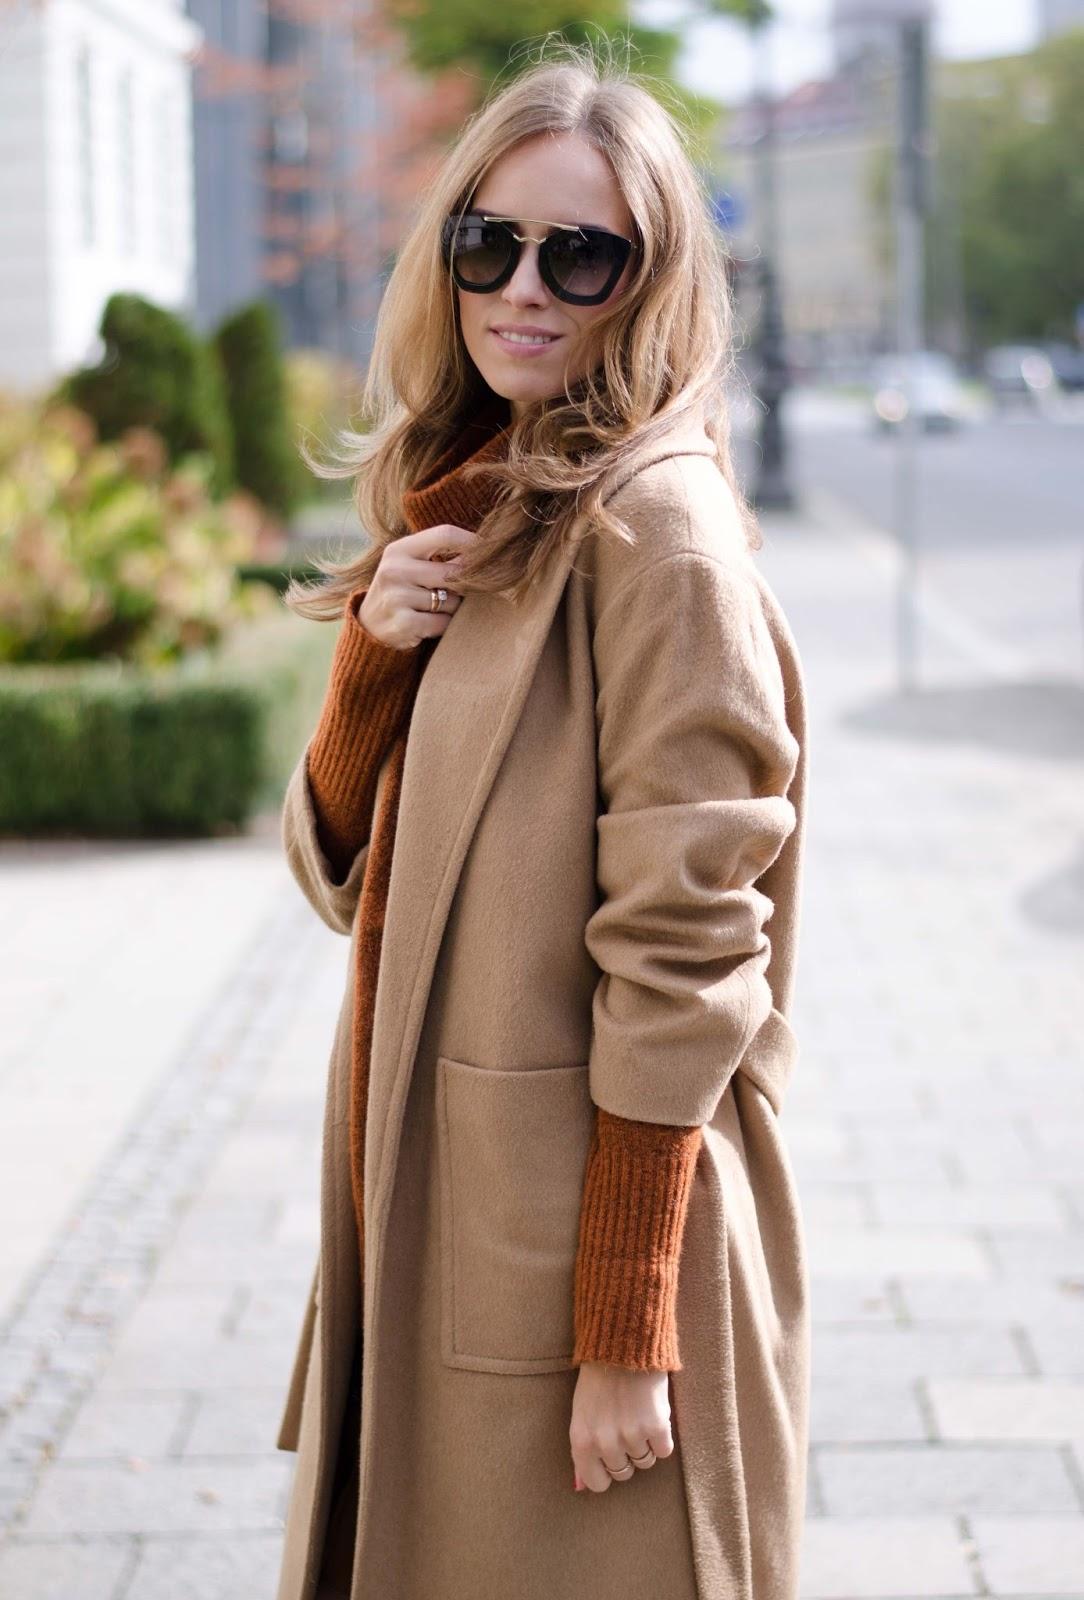 kristjaana mere mango camel coat prada cinema sunglasses street style